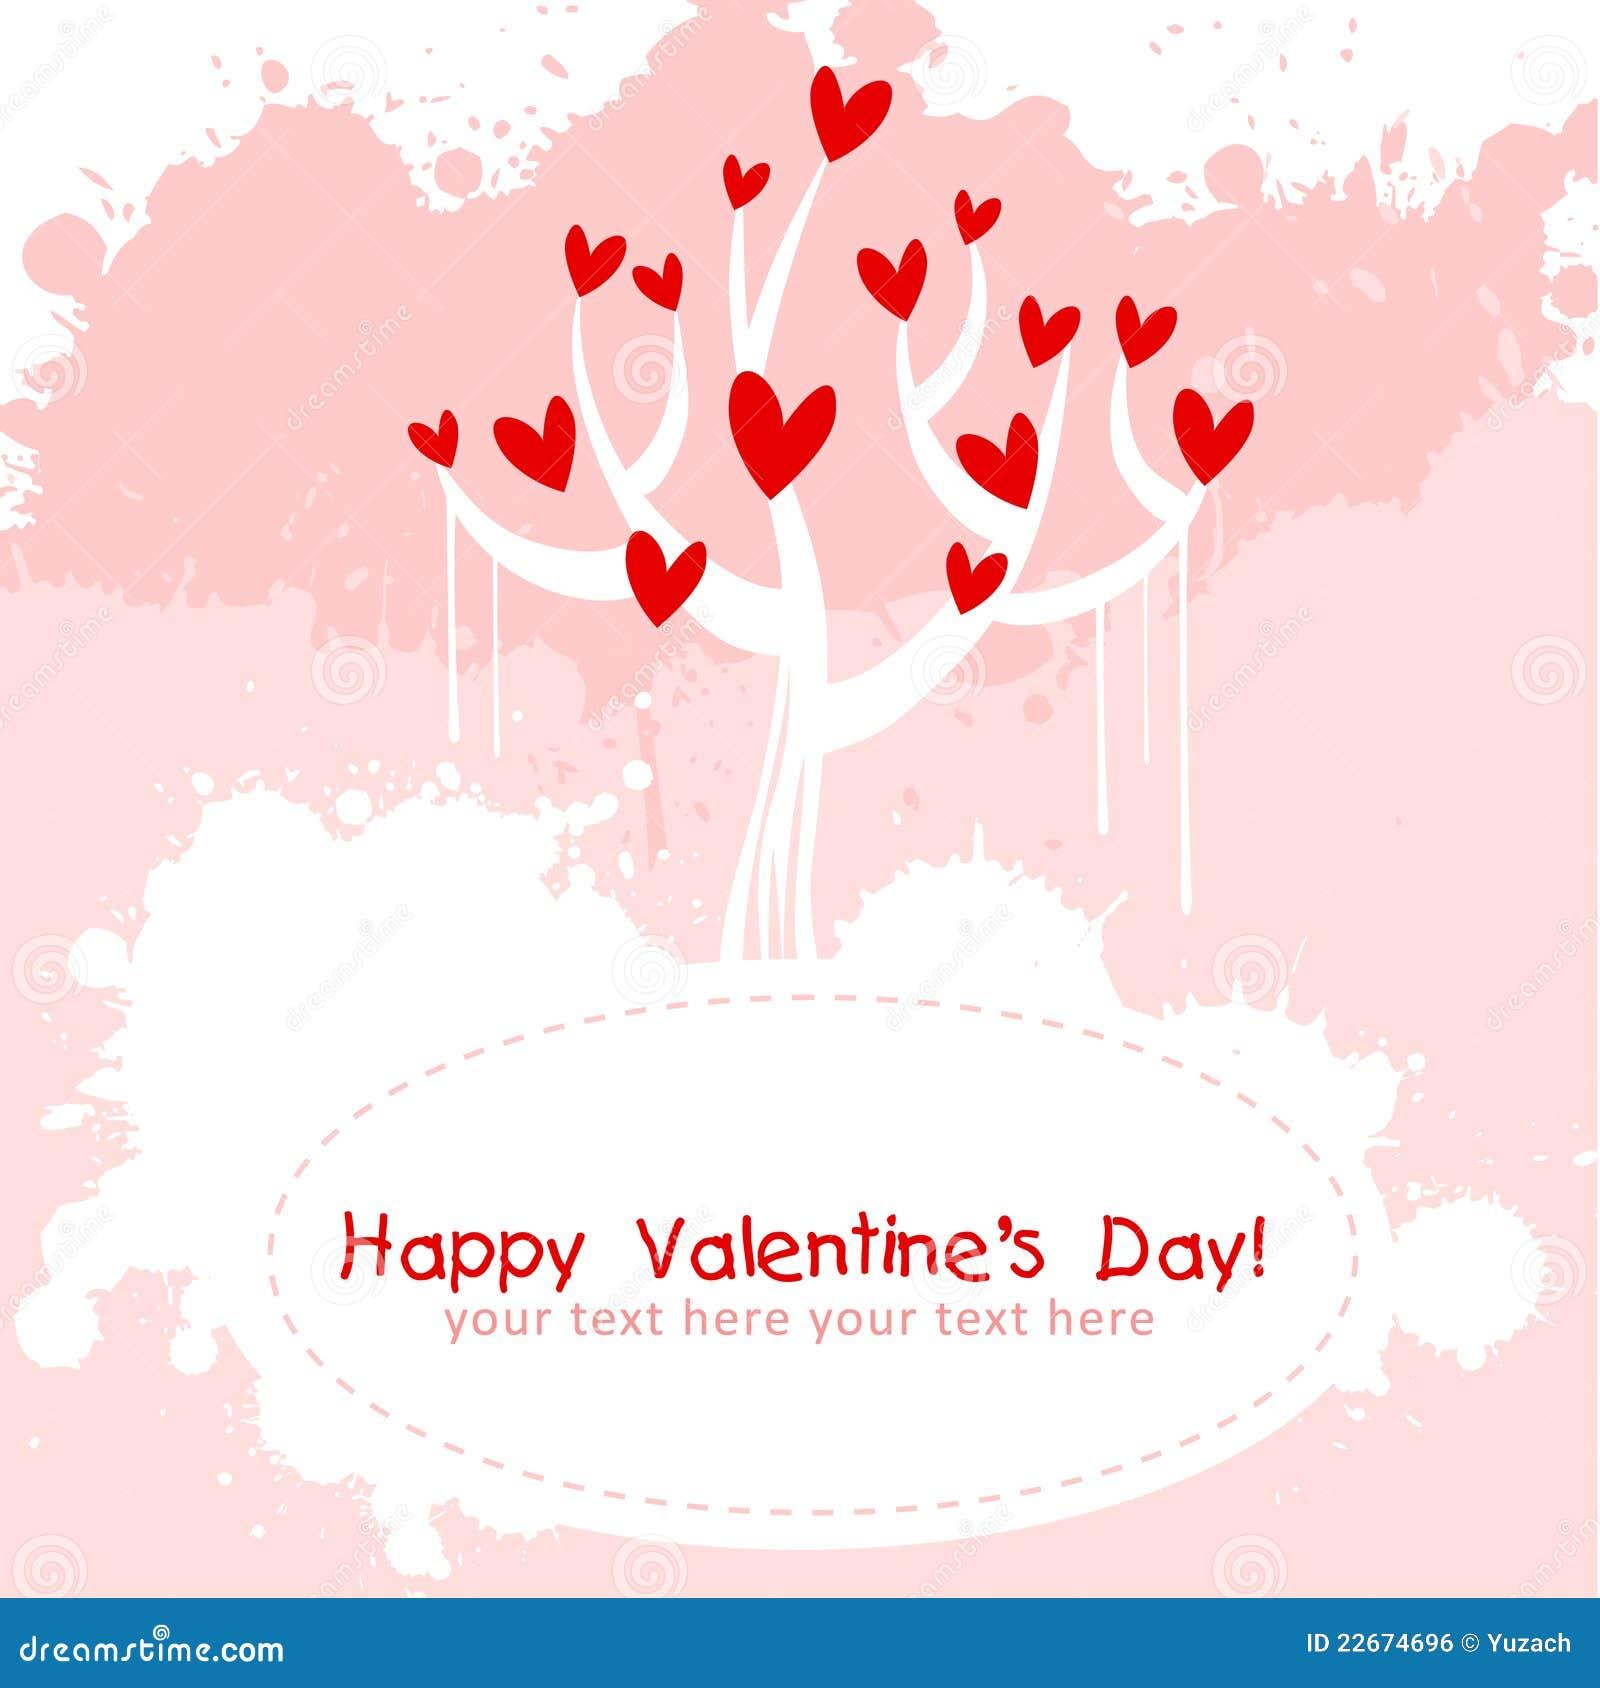 valentine day pink love invitation card stock vector. Black Bedroom Furniture Sets. Home Design Ideas